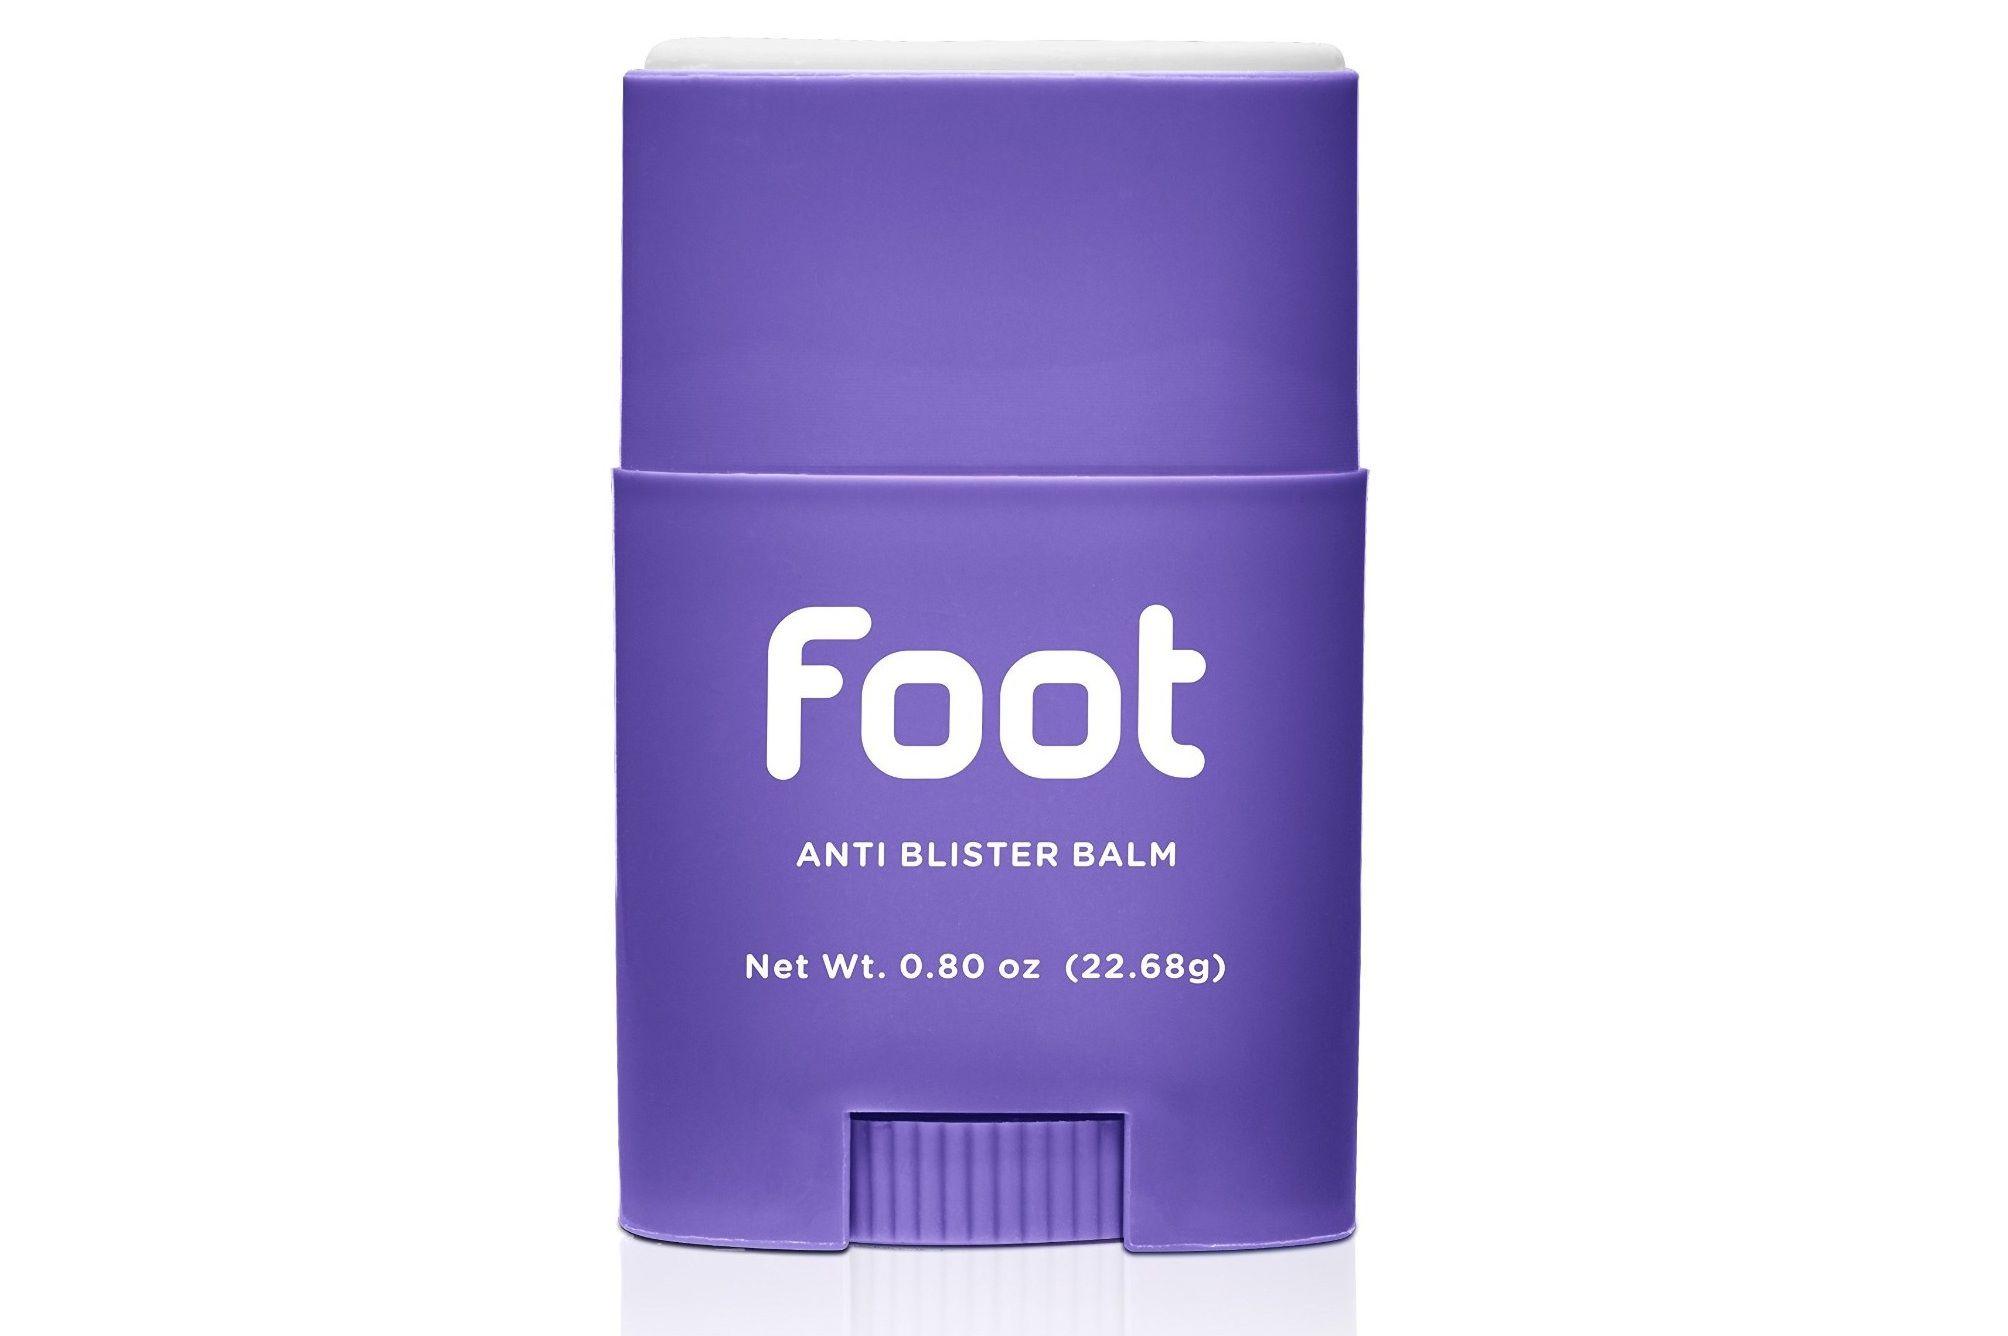 Bálsamo anti ampollas Foot Glide